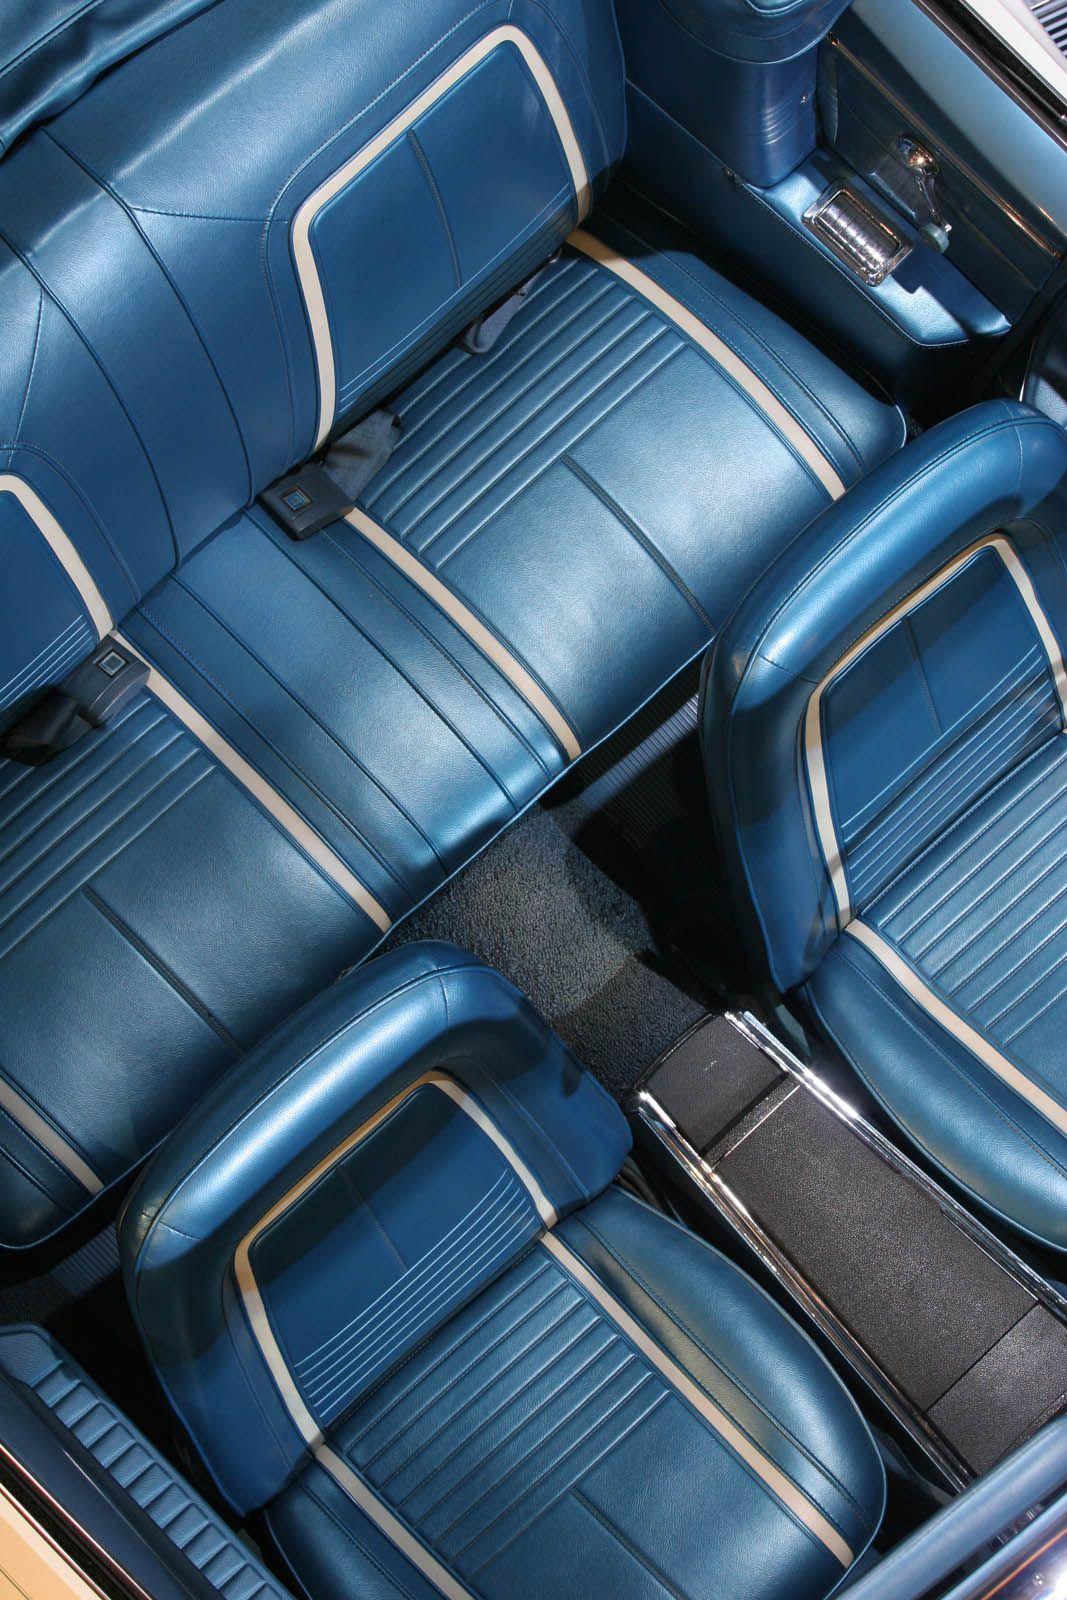 Car interior piping - Hot Rod Upholstery Blue Interiorscar